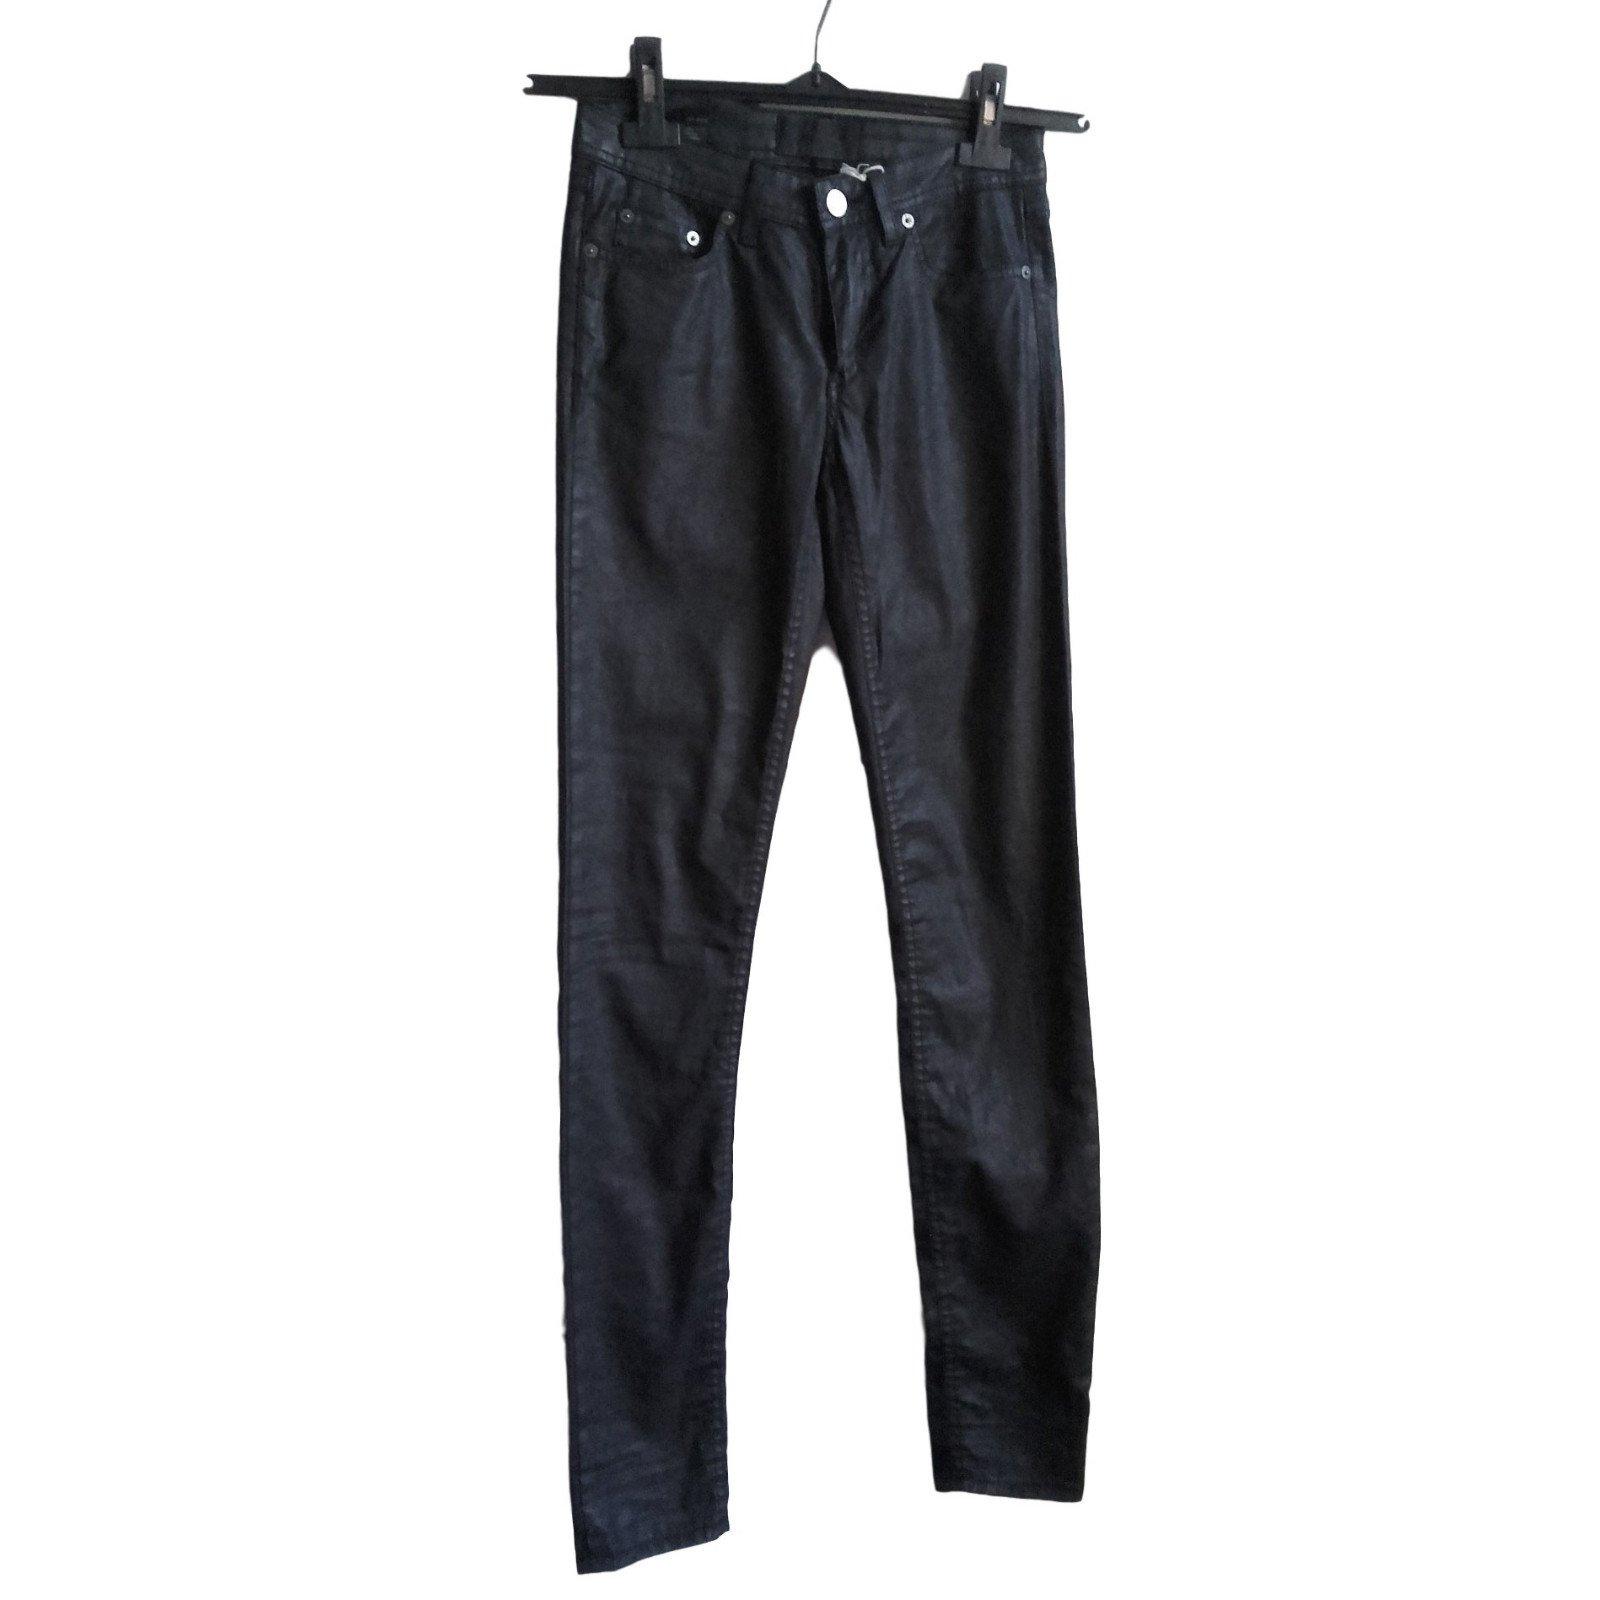 Acne Jean Acné Studio, never worn Pants, leggings Cotton Dark grey ref.38515 556eac9c156